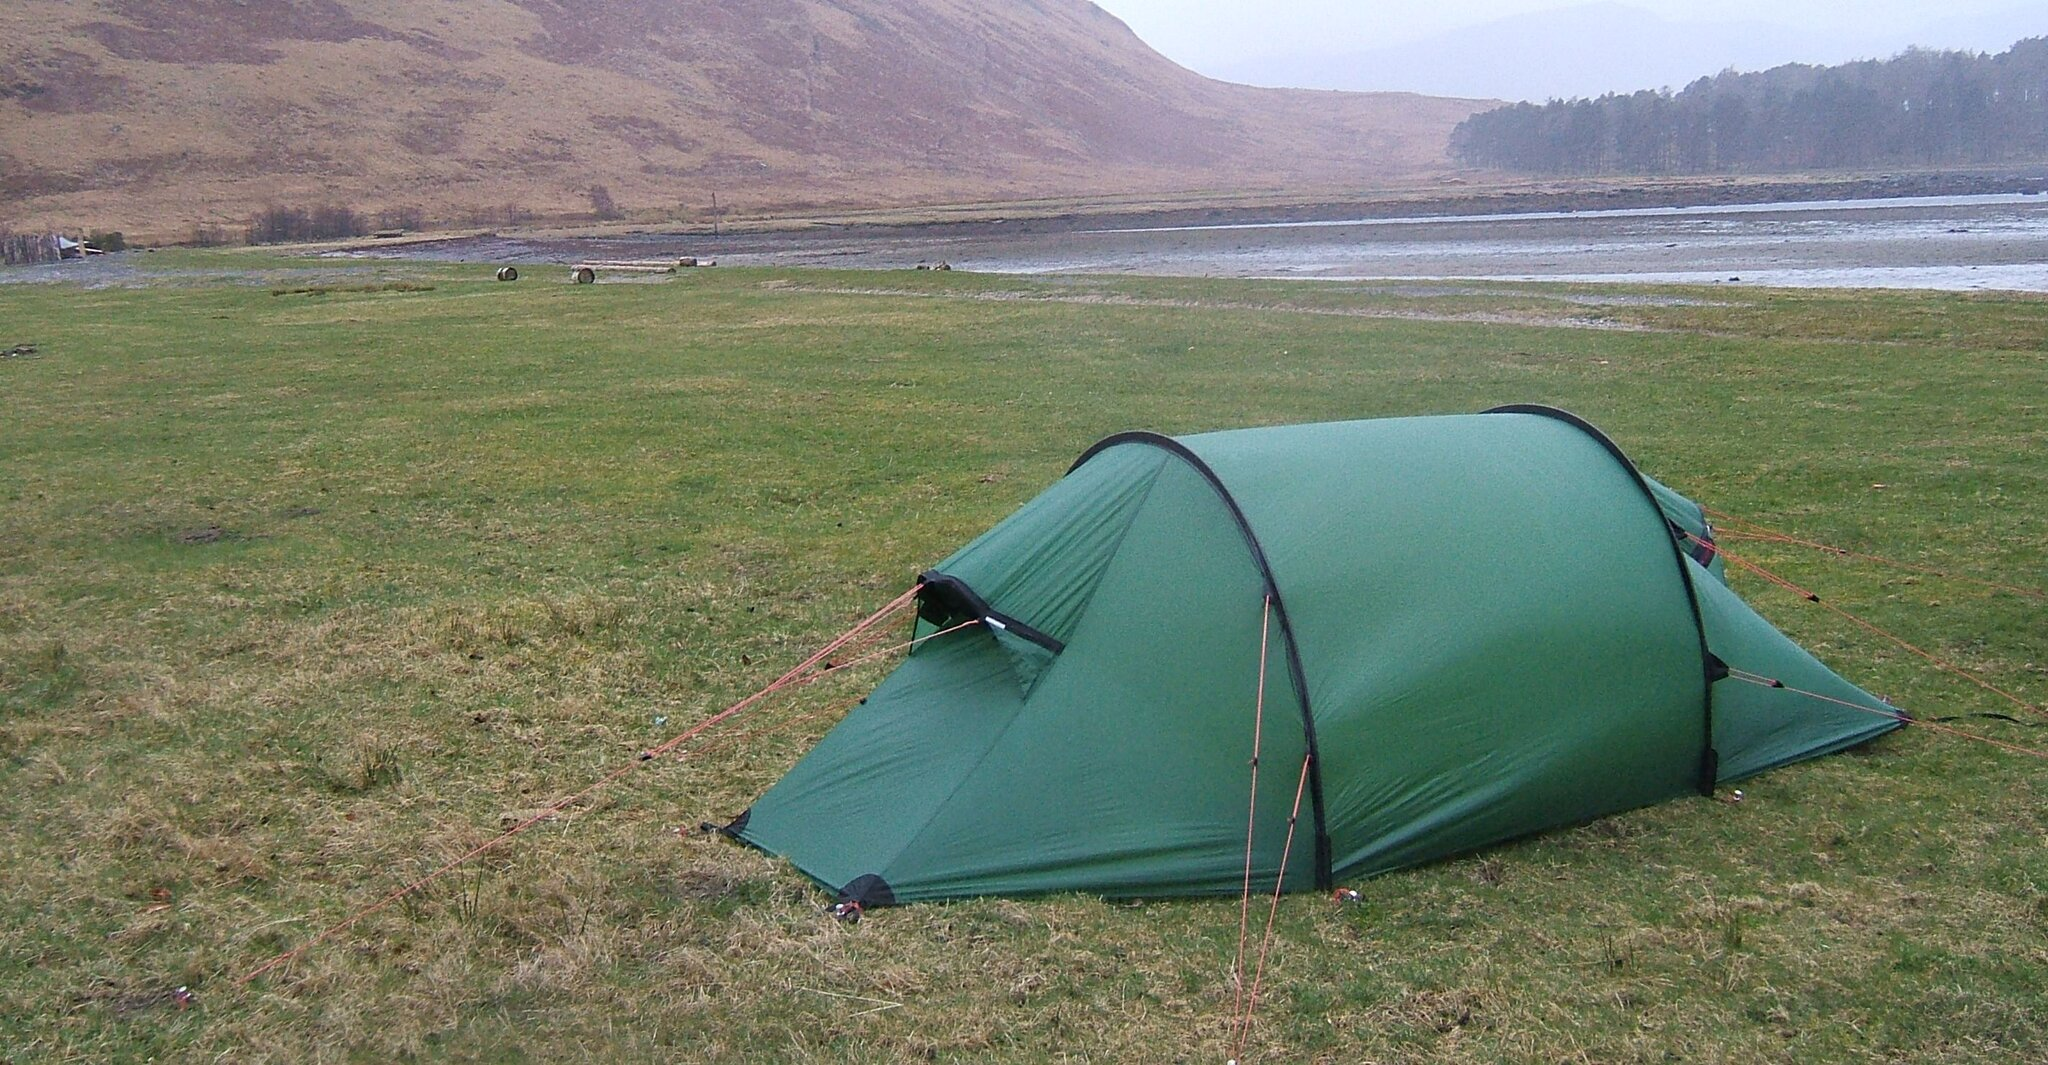 namiot Źródło: LHOON, licencja: CC BY-SA 2.5.